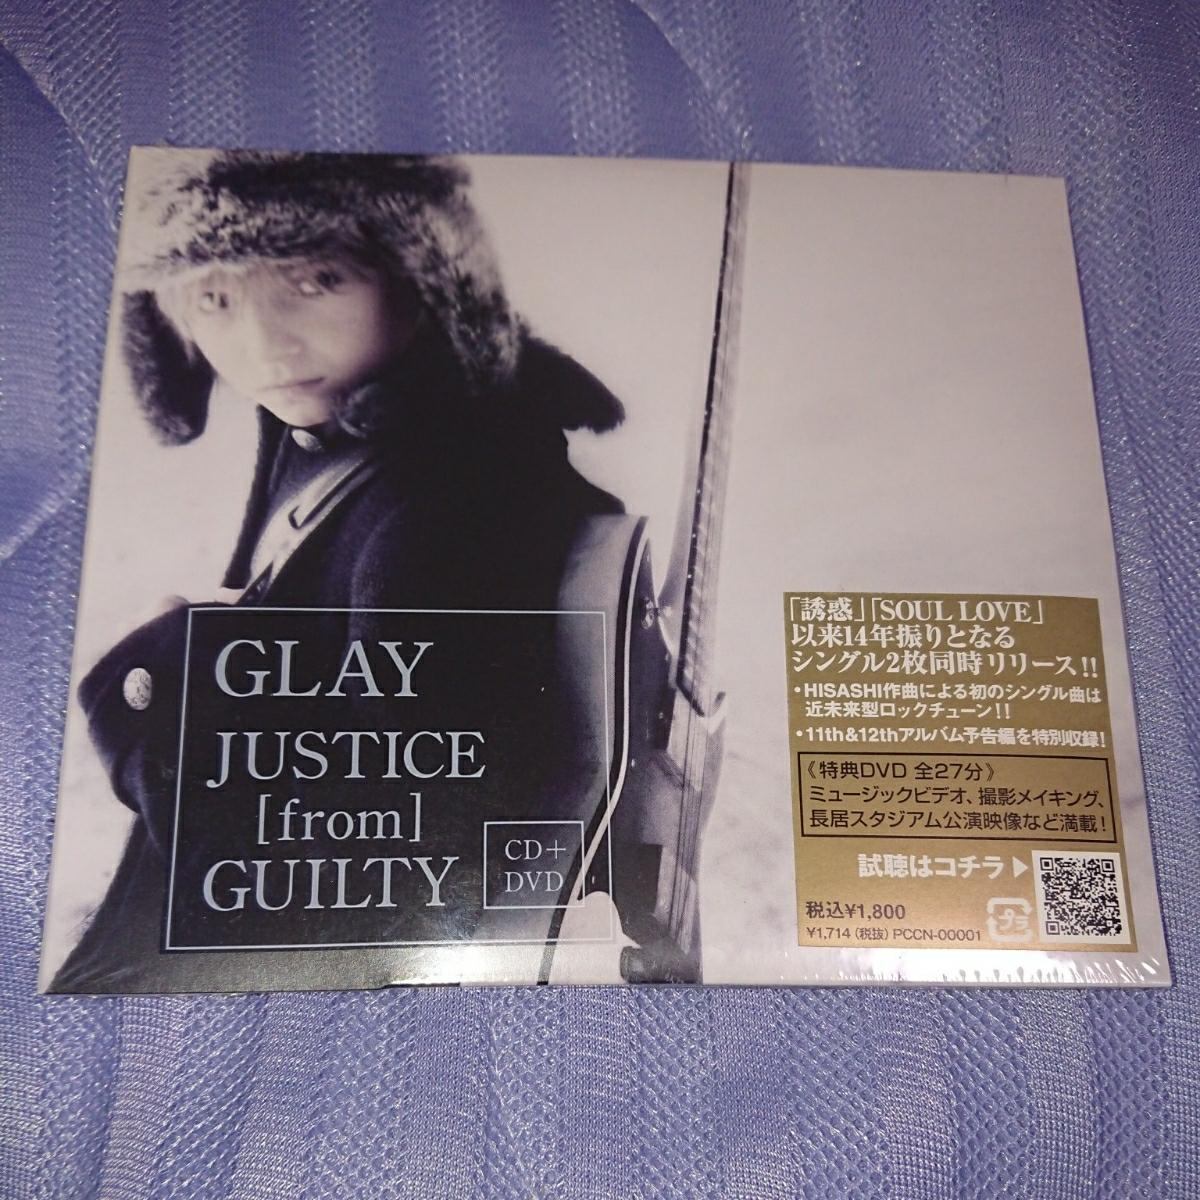 GLAY シングル JUSTICE [from] GUILTY 新品未開封 美品 初回限定 DVD TERU TAKURO HISASHI JIRO 即決